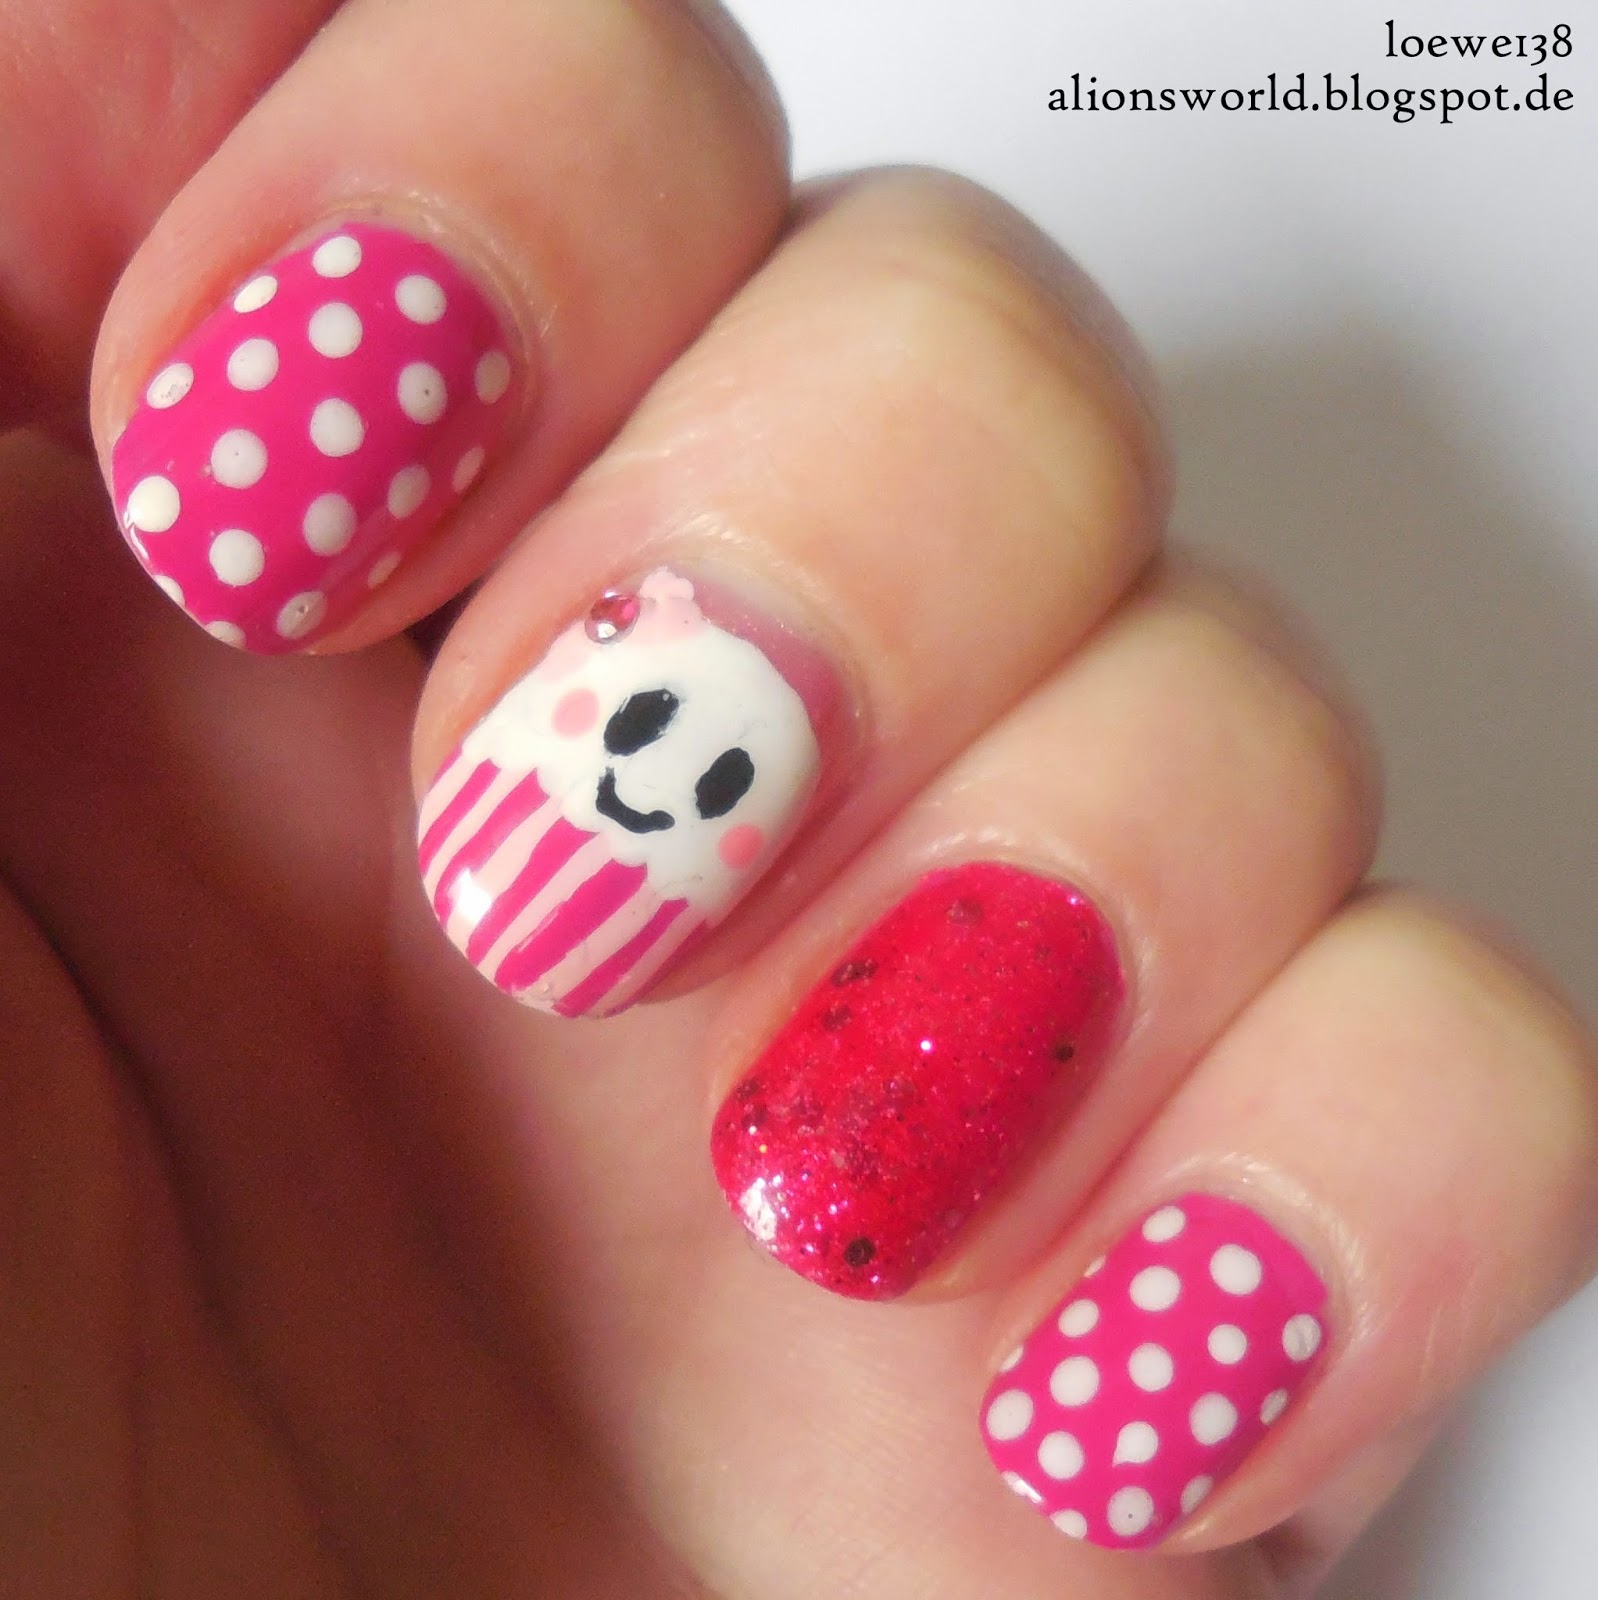 http://alionsworld.blogspot.com/2015/01/sweet-cupcake.html